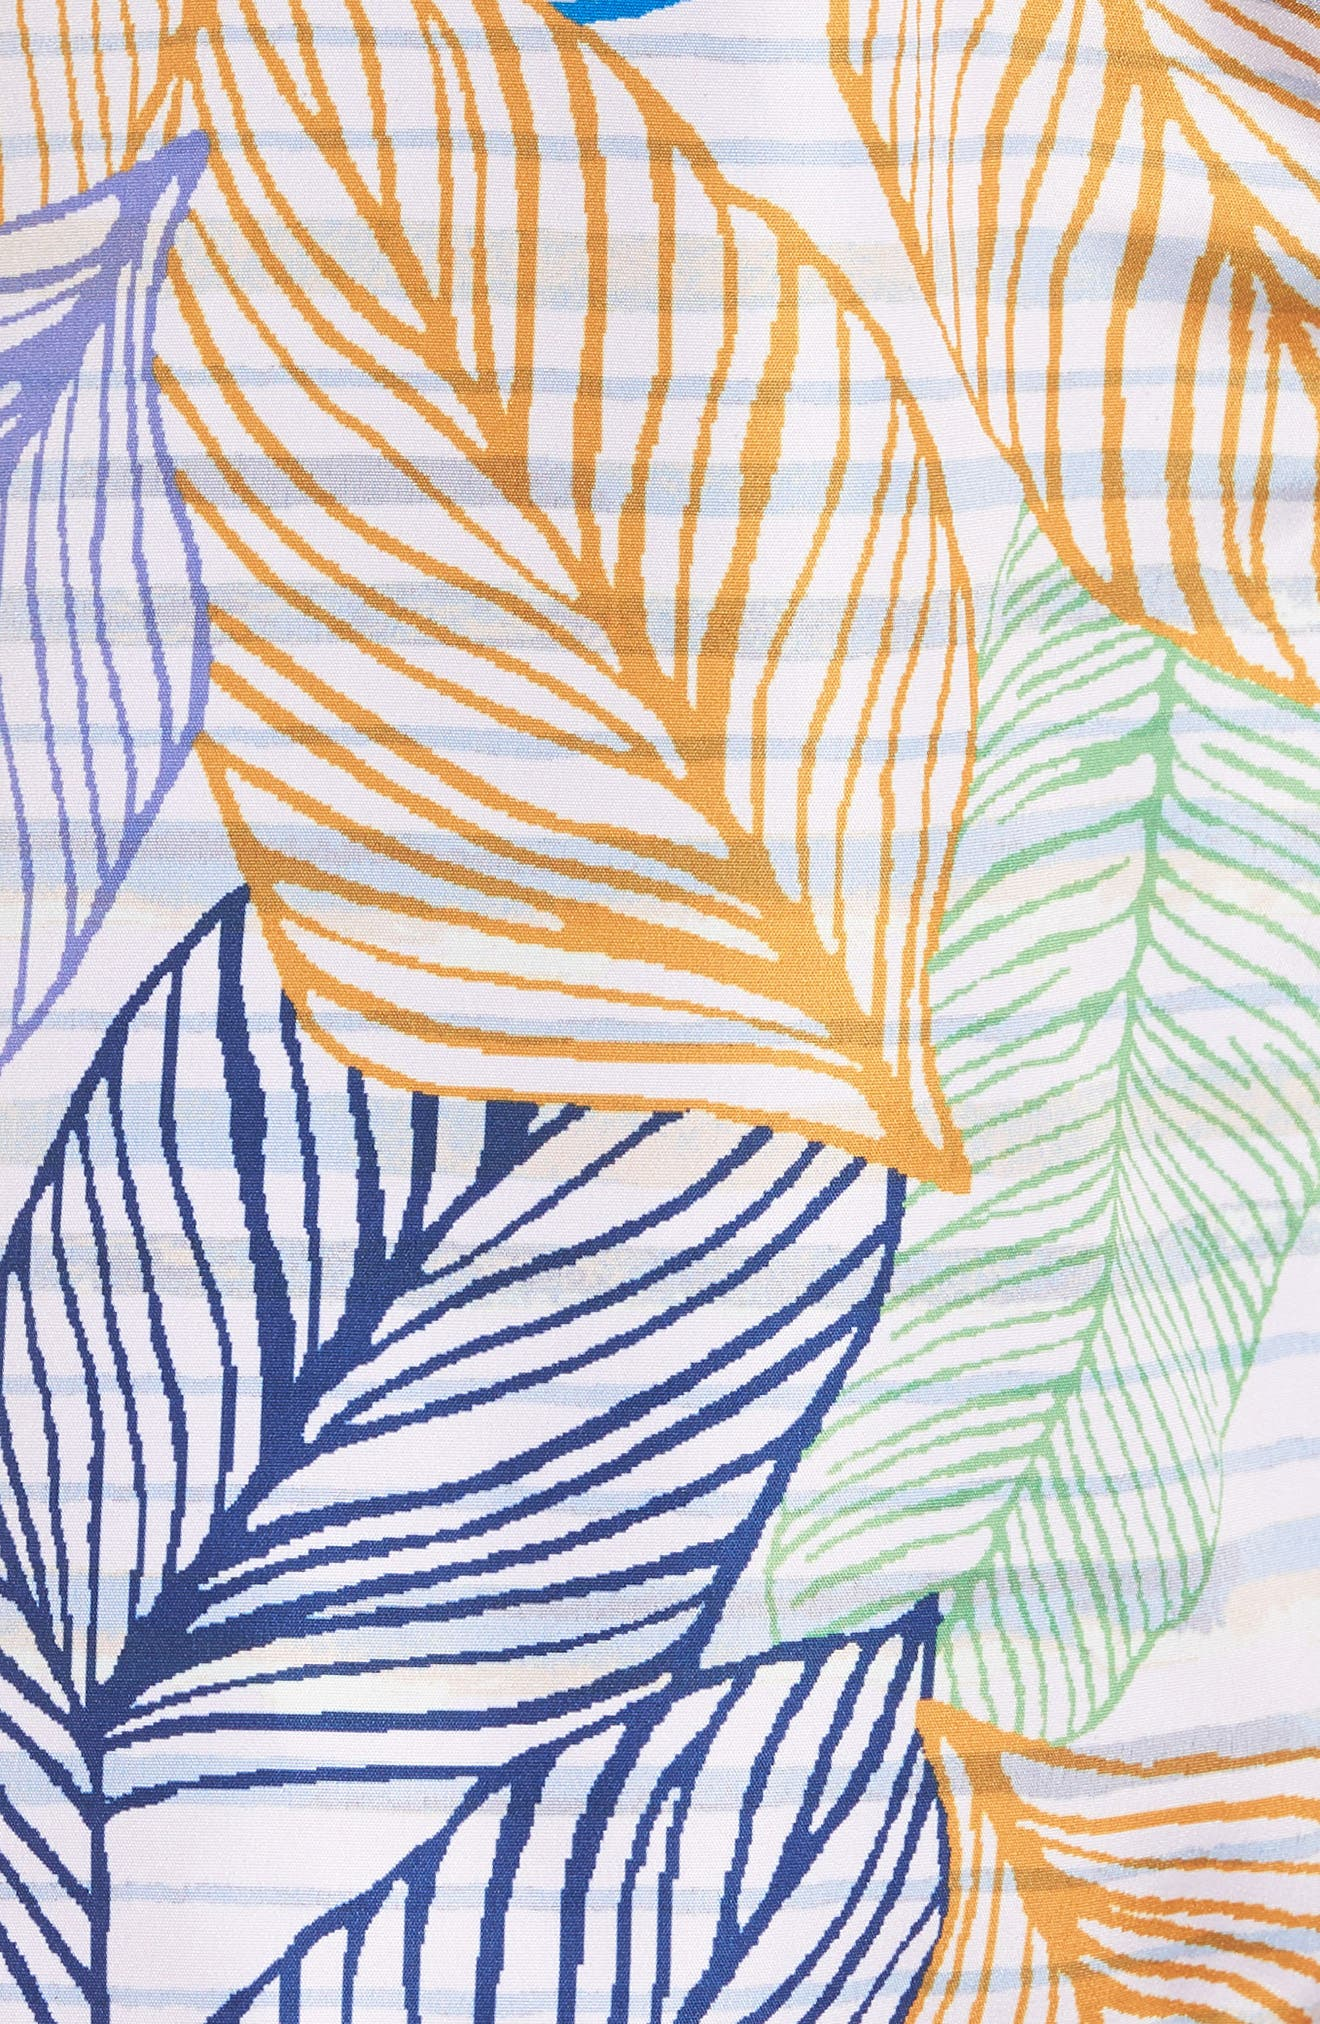 Blue Sky Reversible Swim Trunks,                             Alternate thumbnail 6, color,                             MULTICOLOR